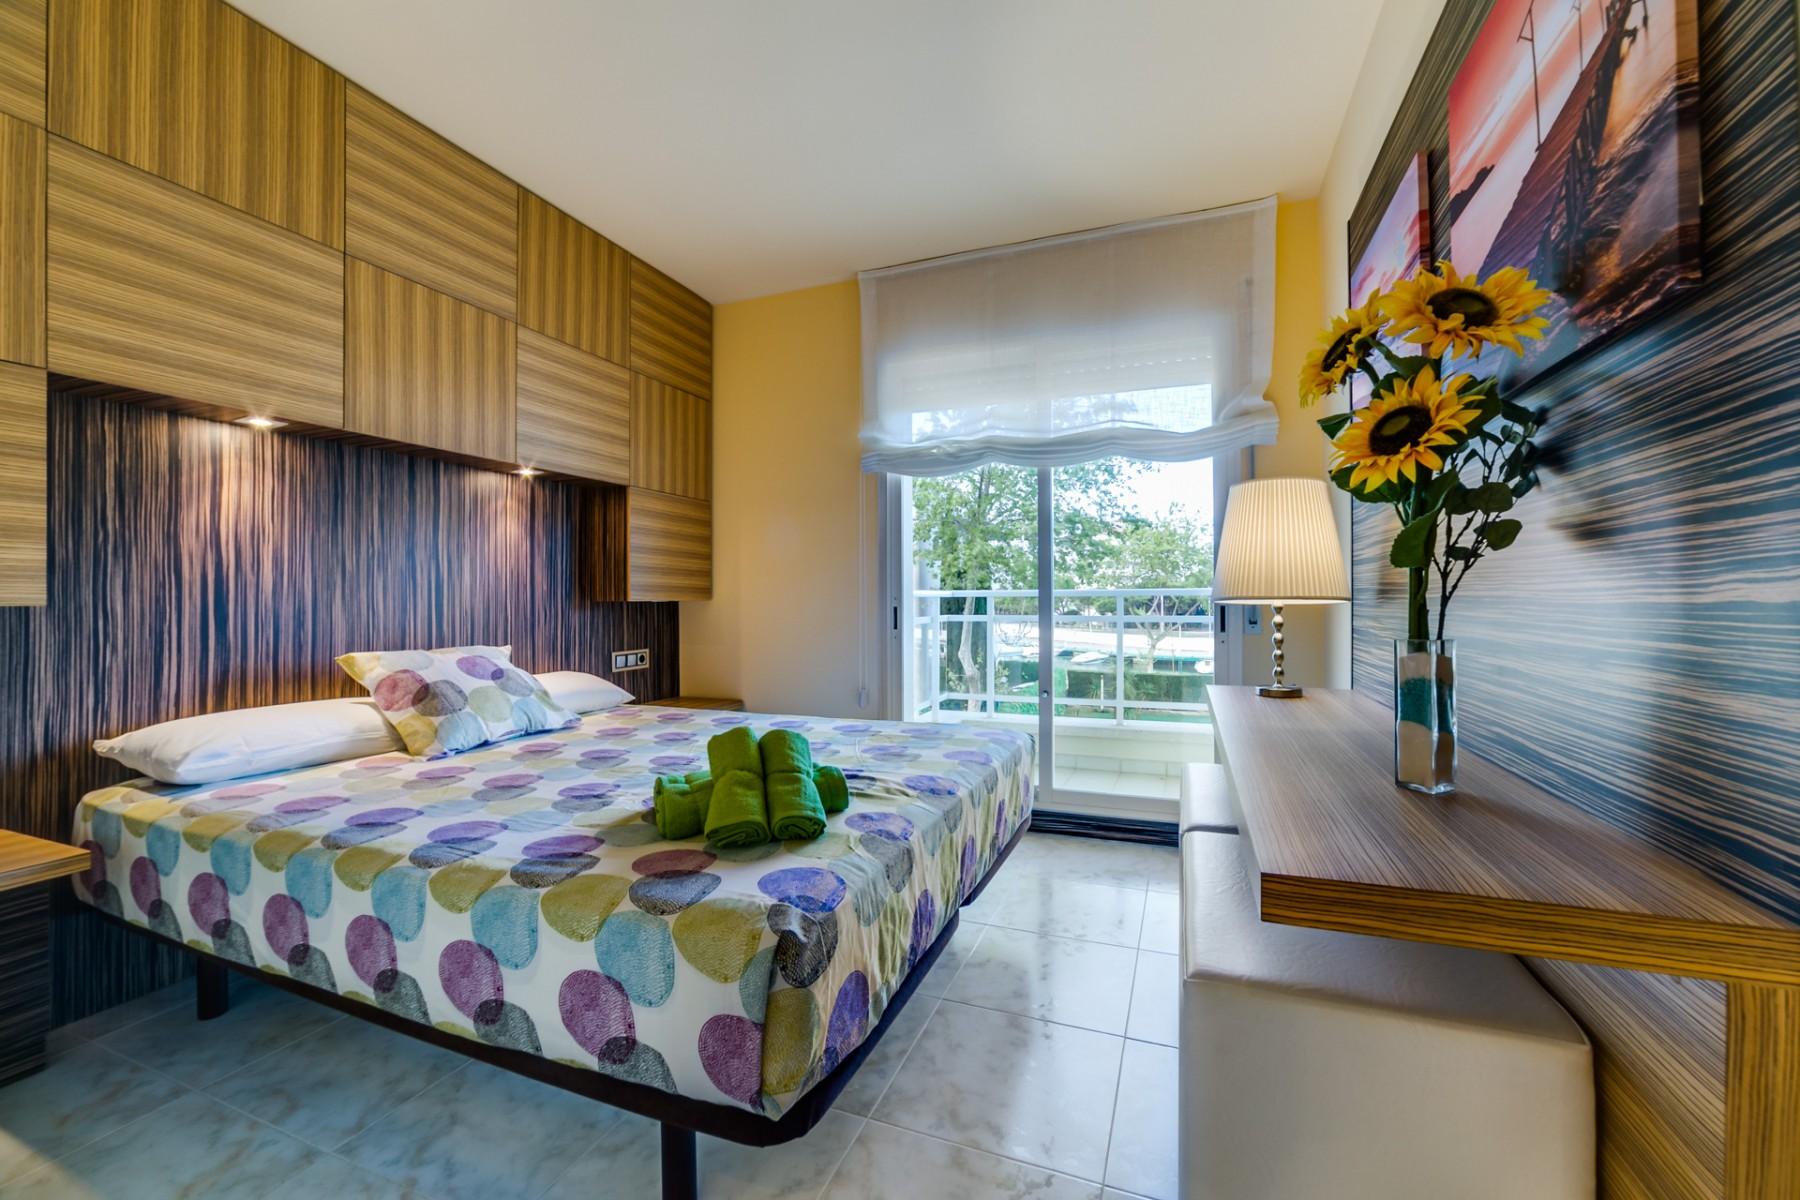 Vivalidays sa conca apartamentos en platja d aro - Alquiler pisos platja d aro ...